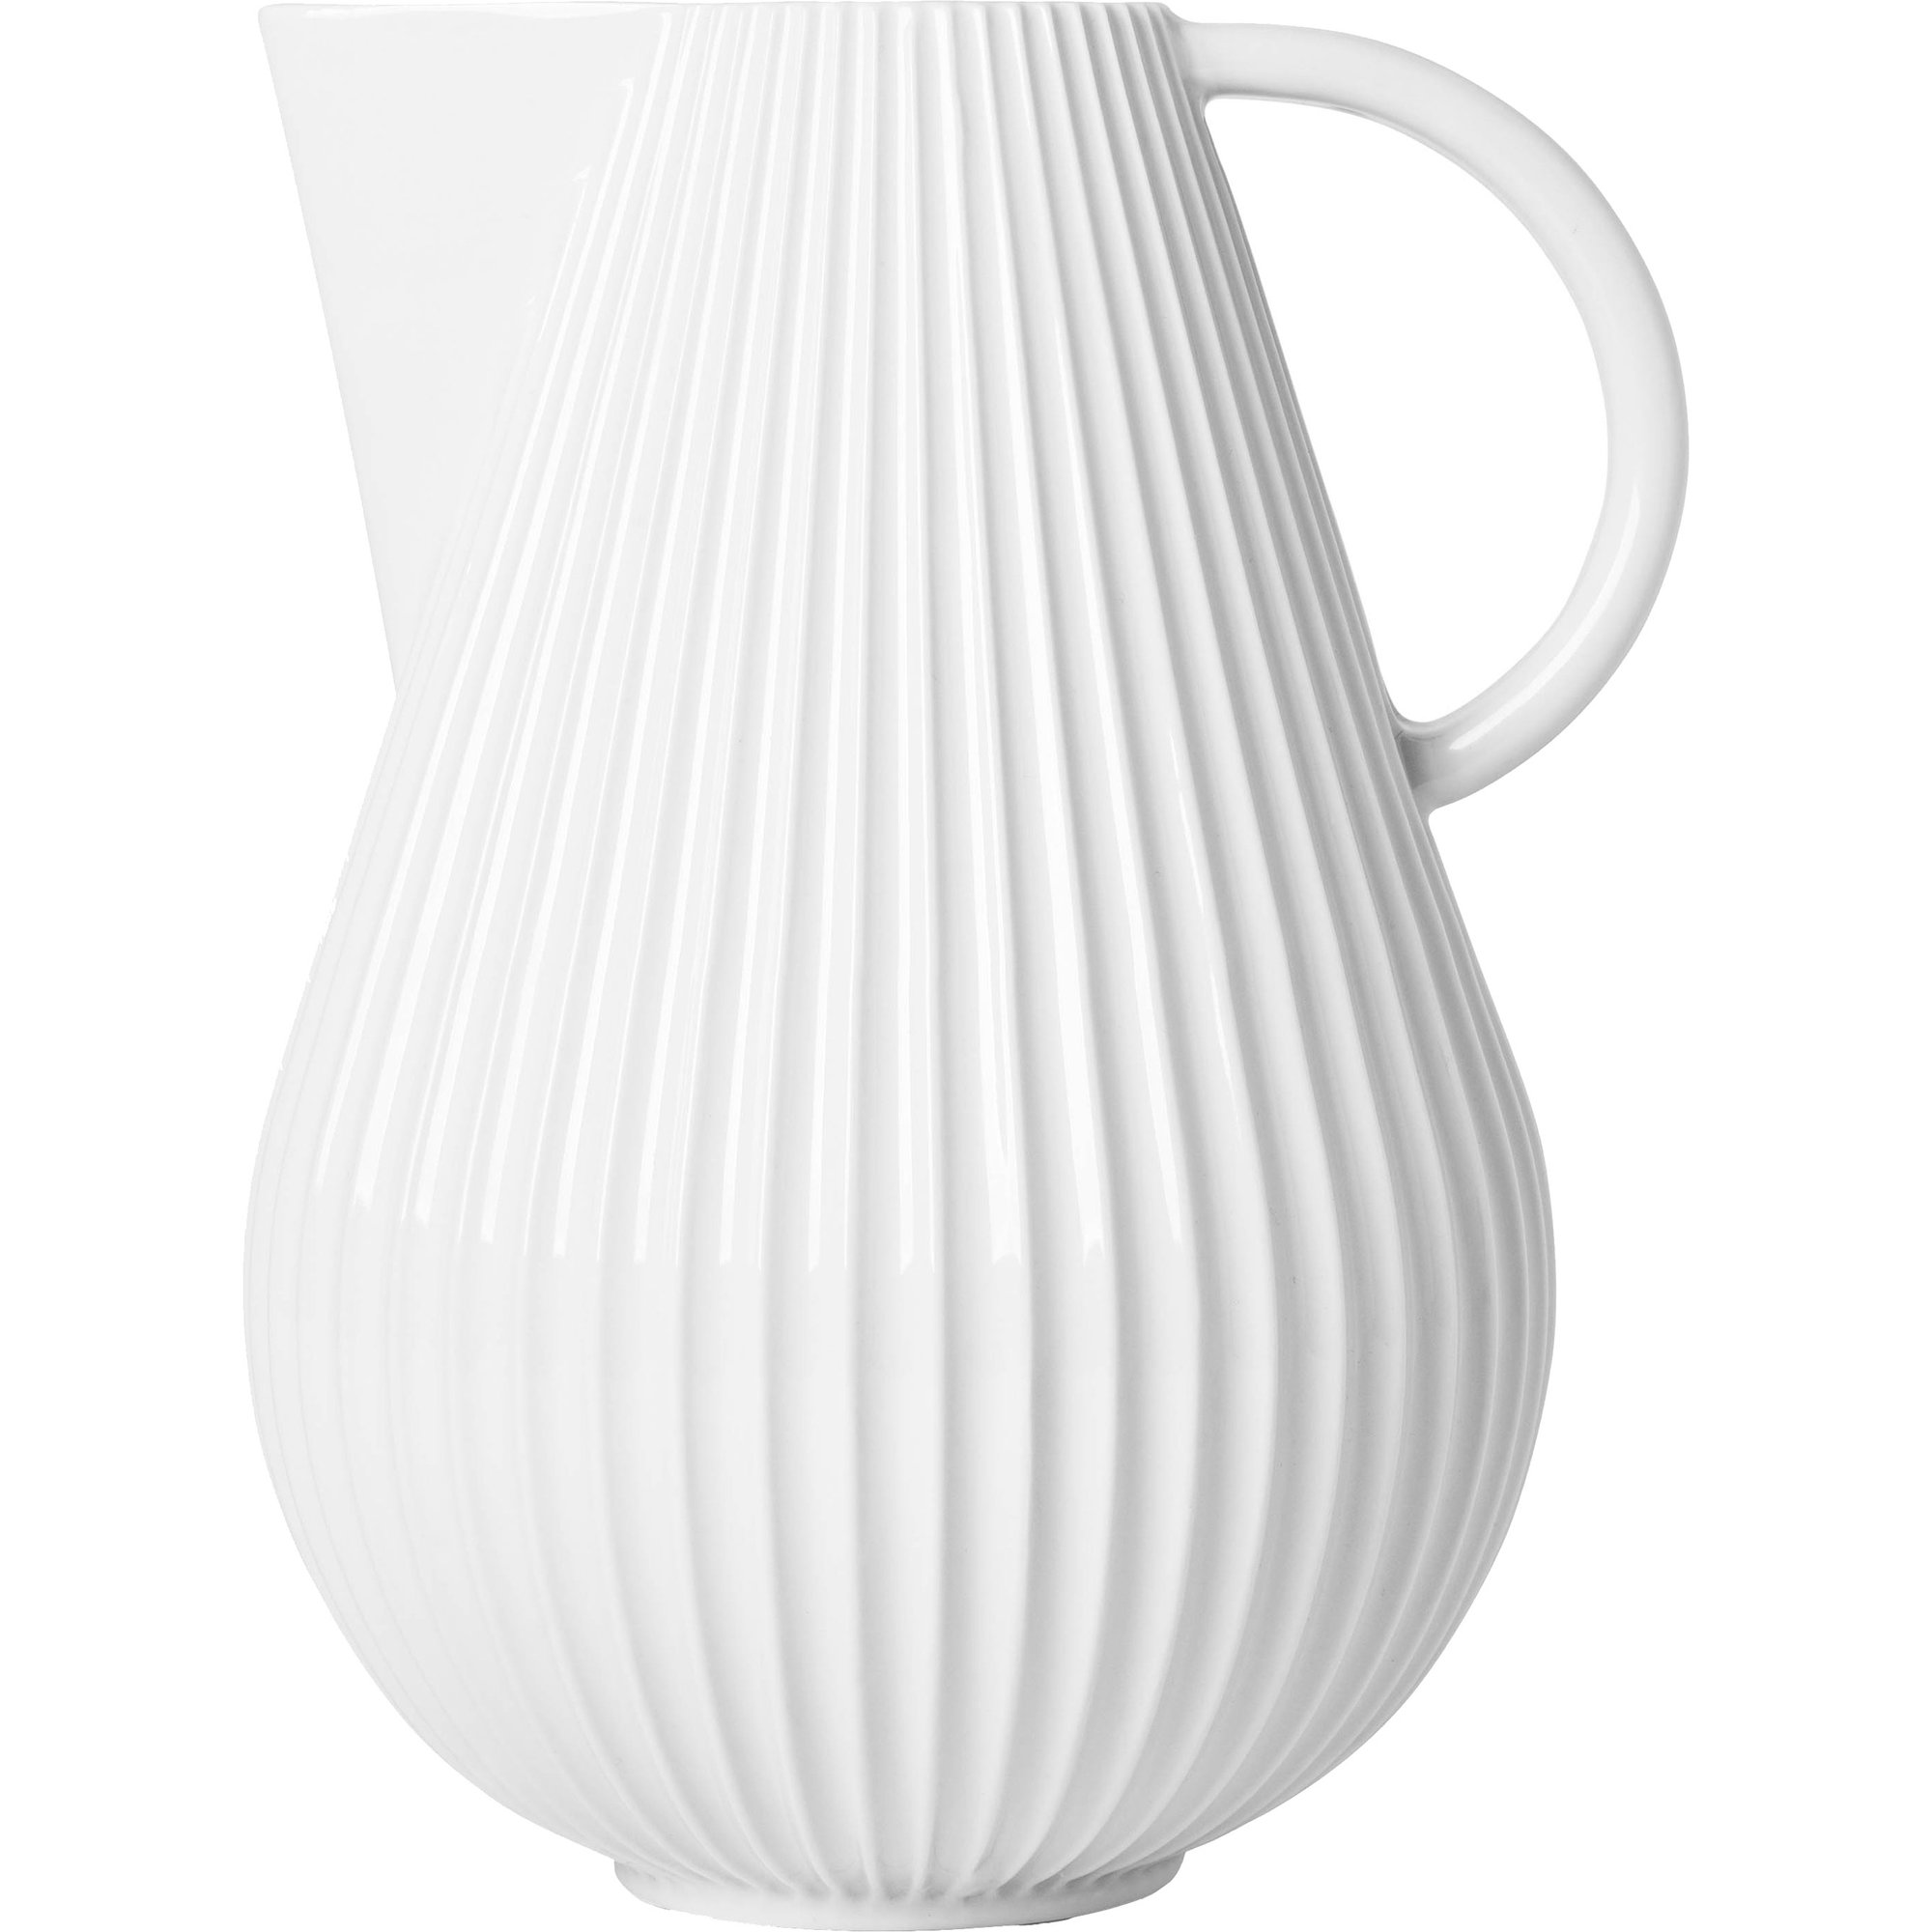 Lyngby Porcelæn Tura Kanna Vas 275 cm.